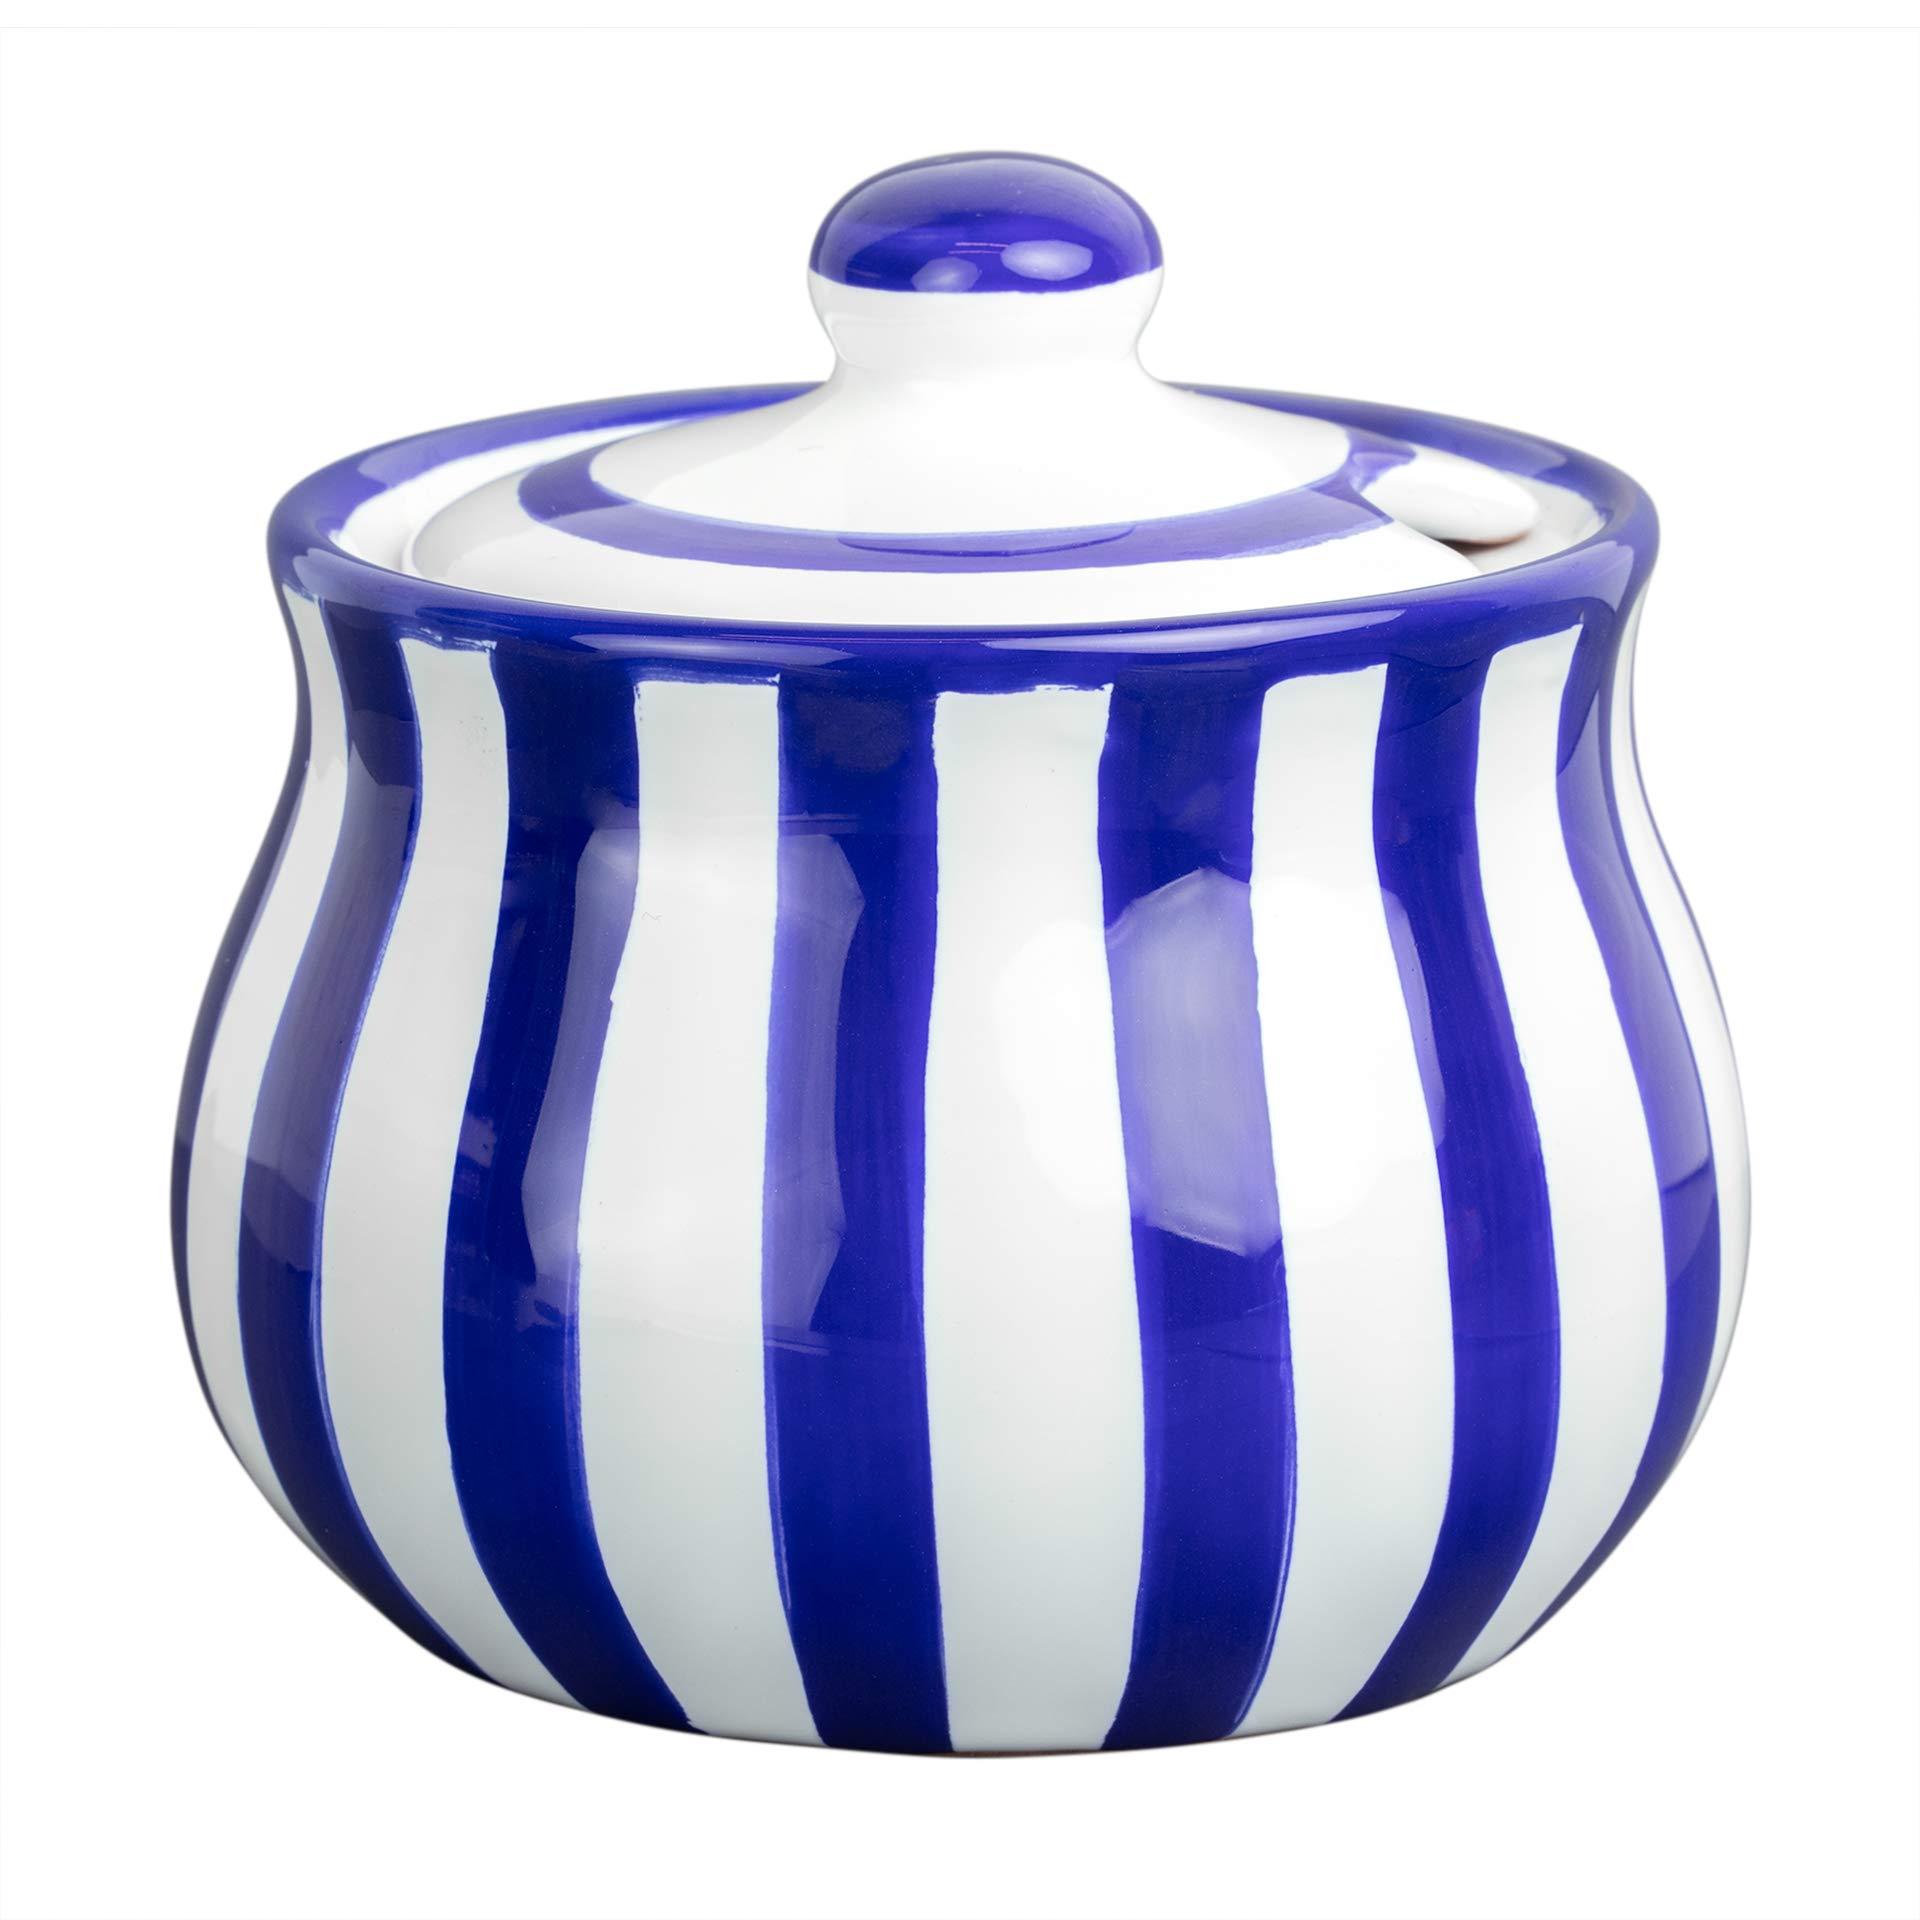 City to Cottage Handmade Dark Navy Blue Stripe Ceramic Sugar Bowl, Pot with Lid   Pottery Honey Jar, Jam Jar   Housewarming Gift